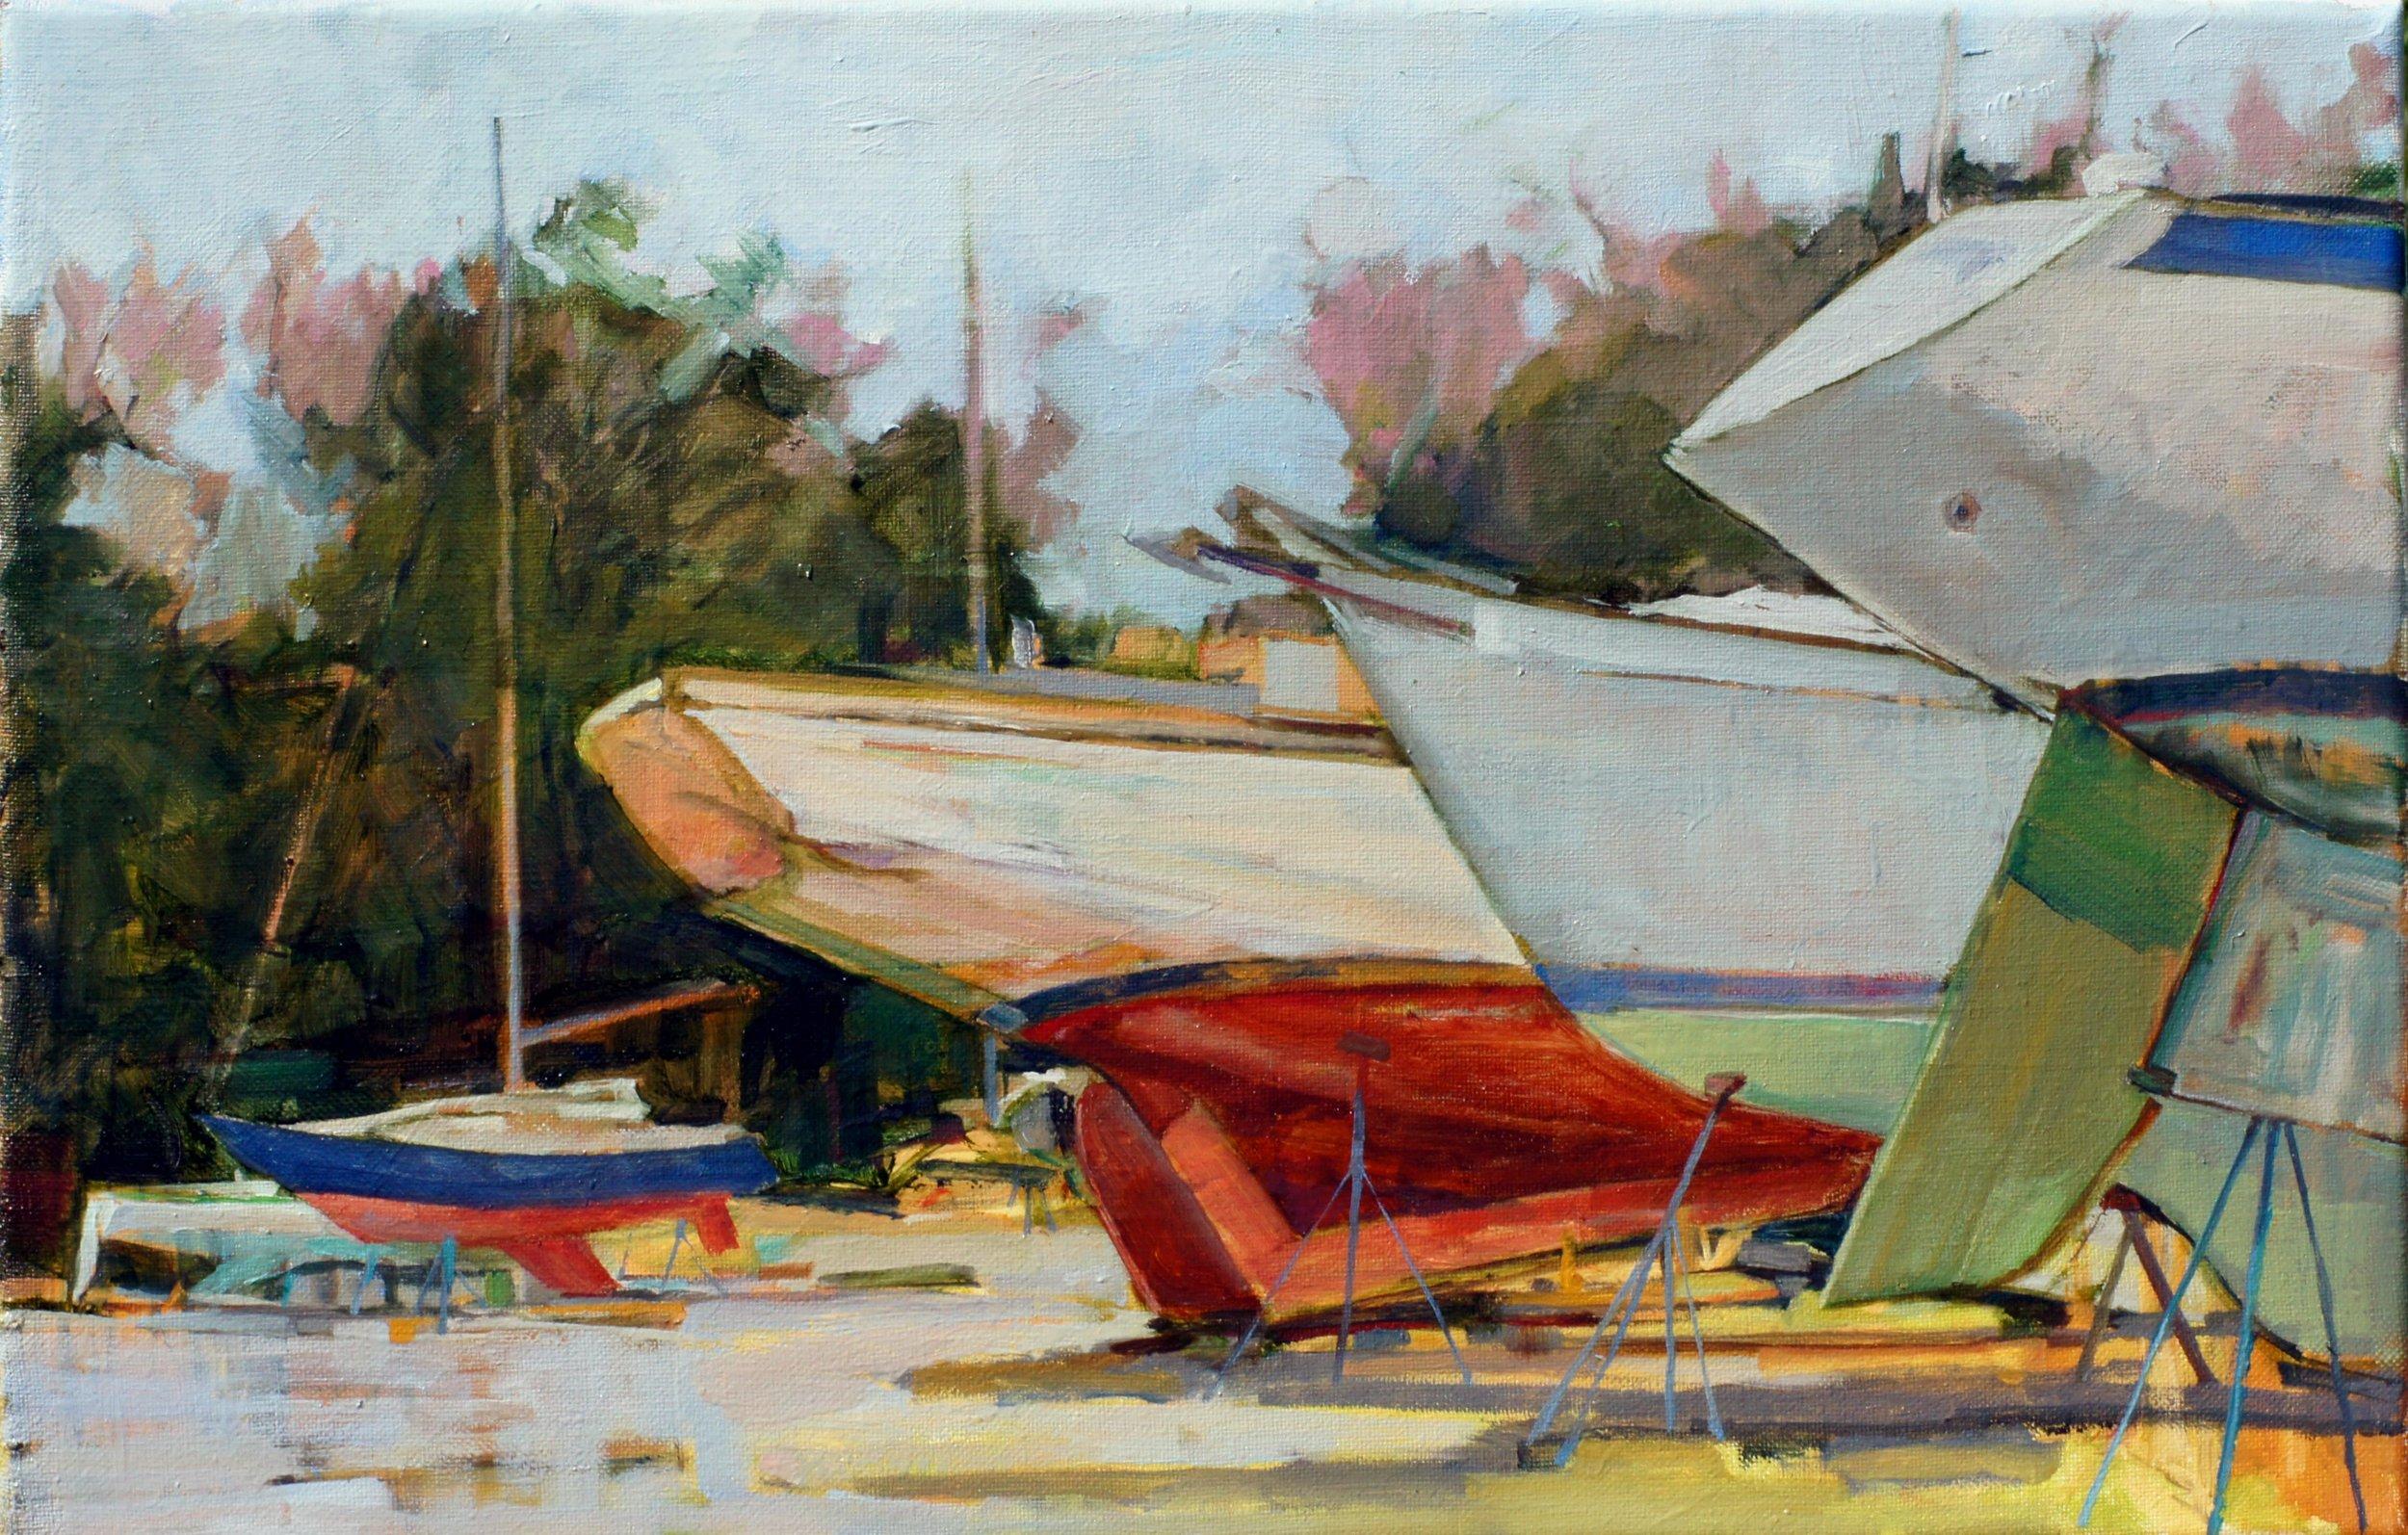 11x17 07 15 15 boatyard.jpg